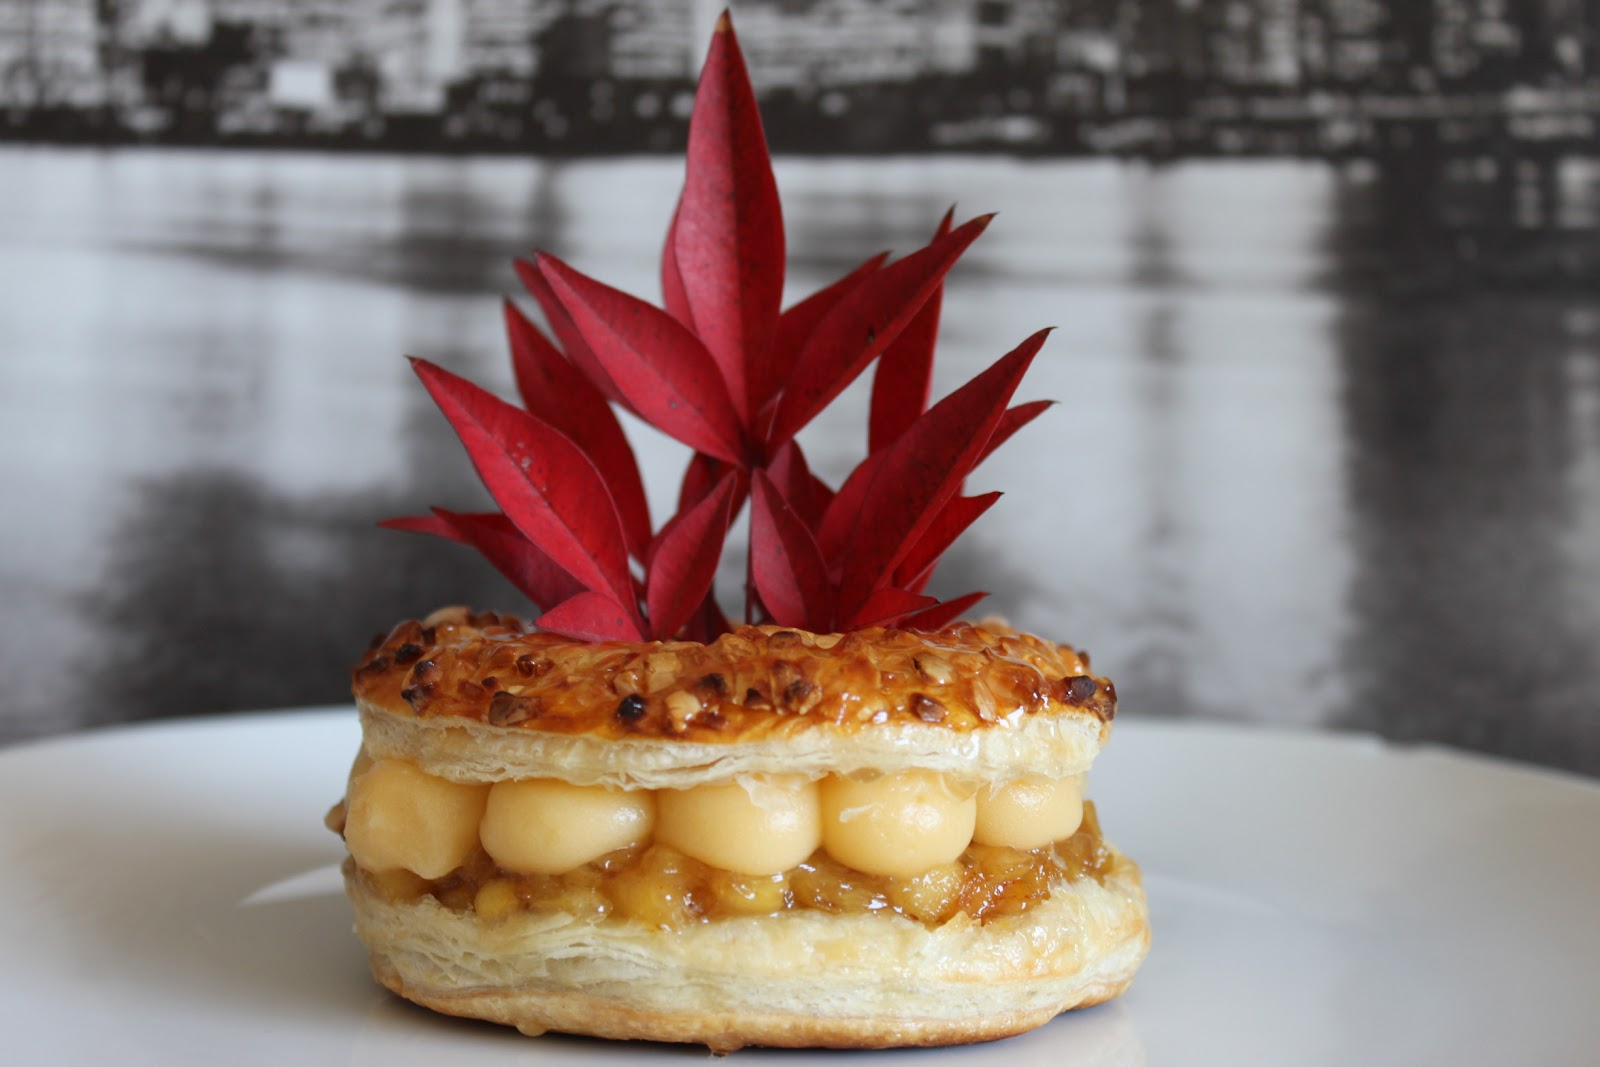 Mini roscon de hojaldre almendrados, compota de manzana y crema catalana